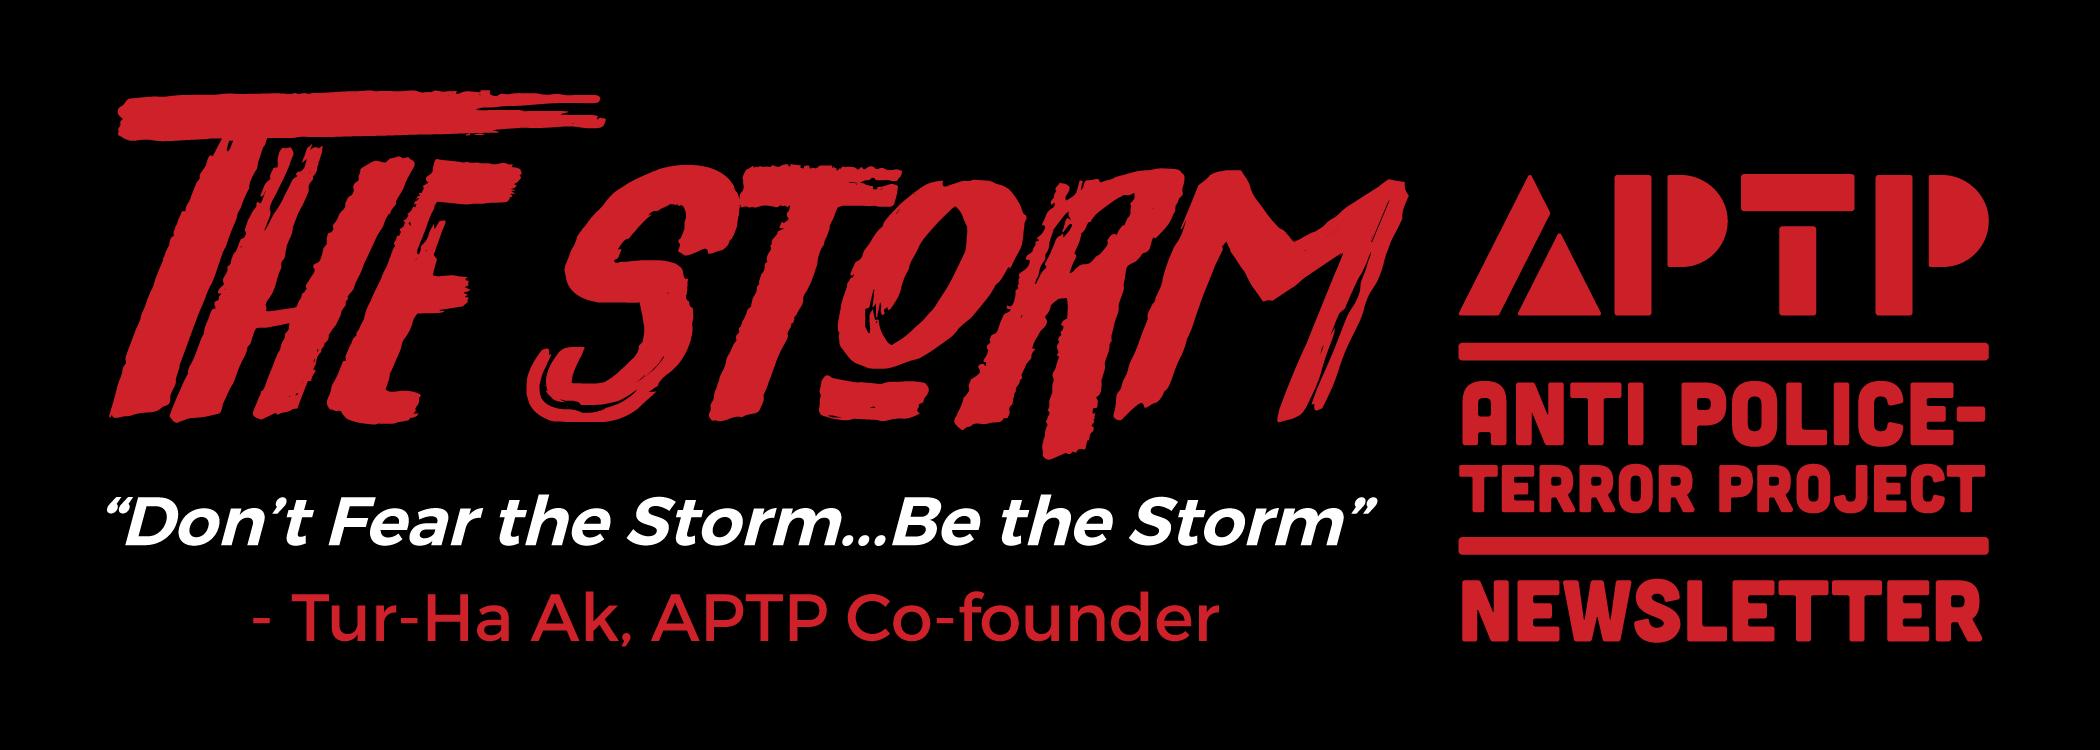 Storm MASTER masthead final2.png